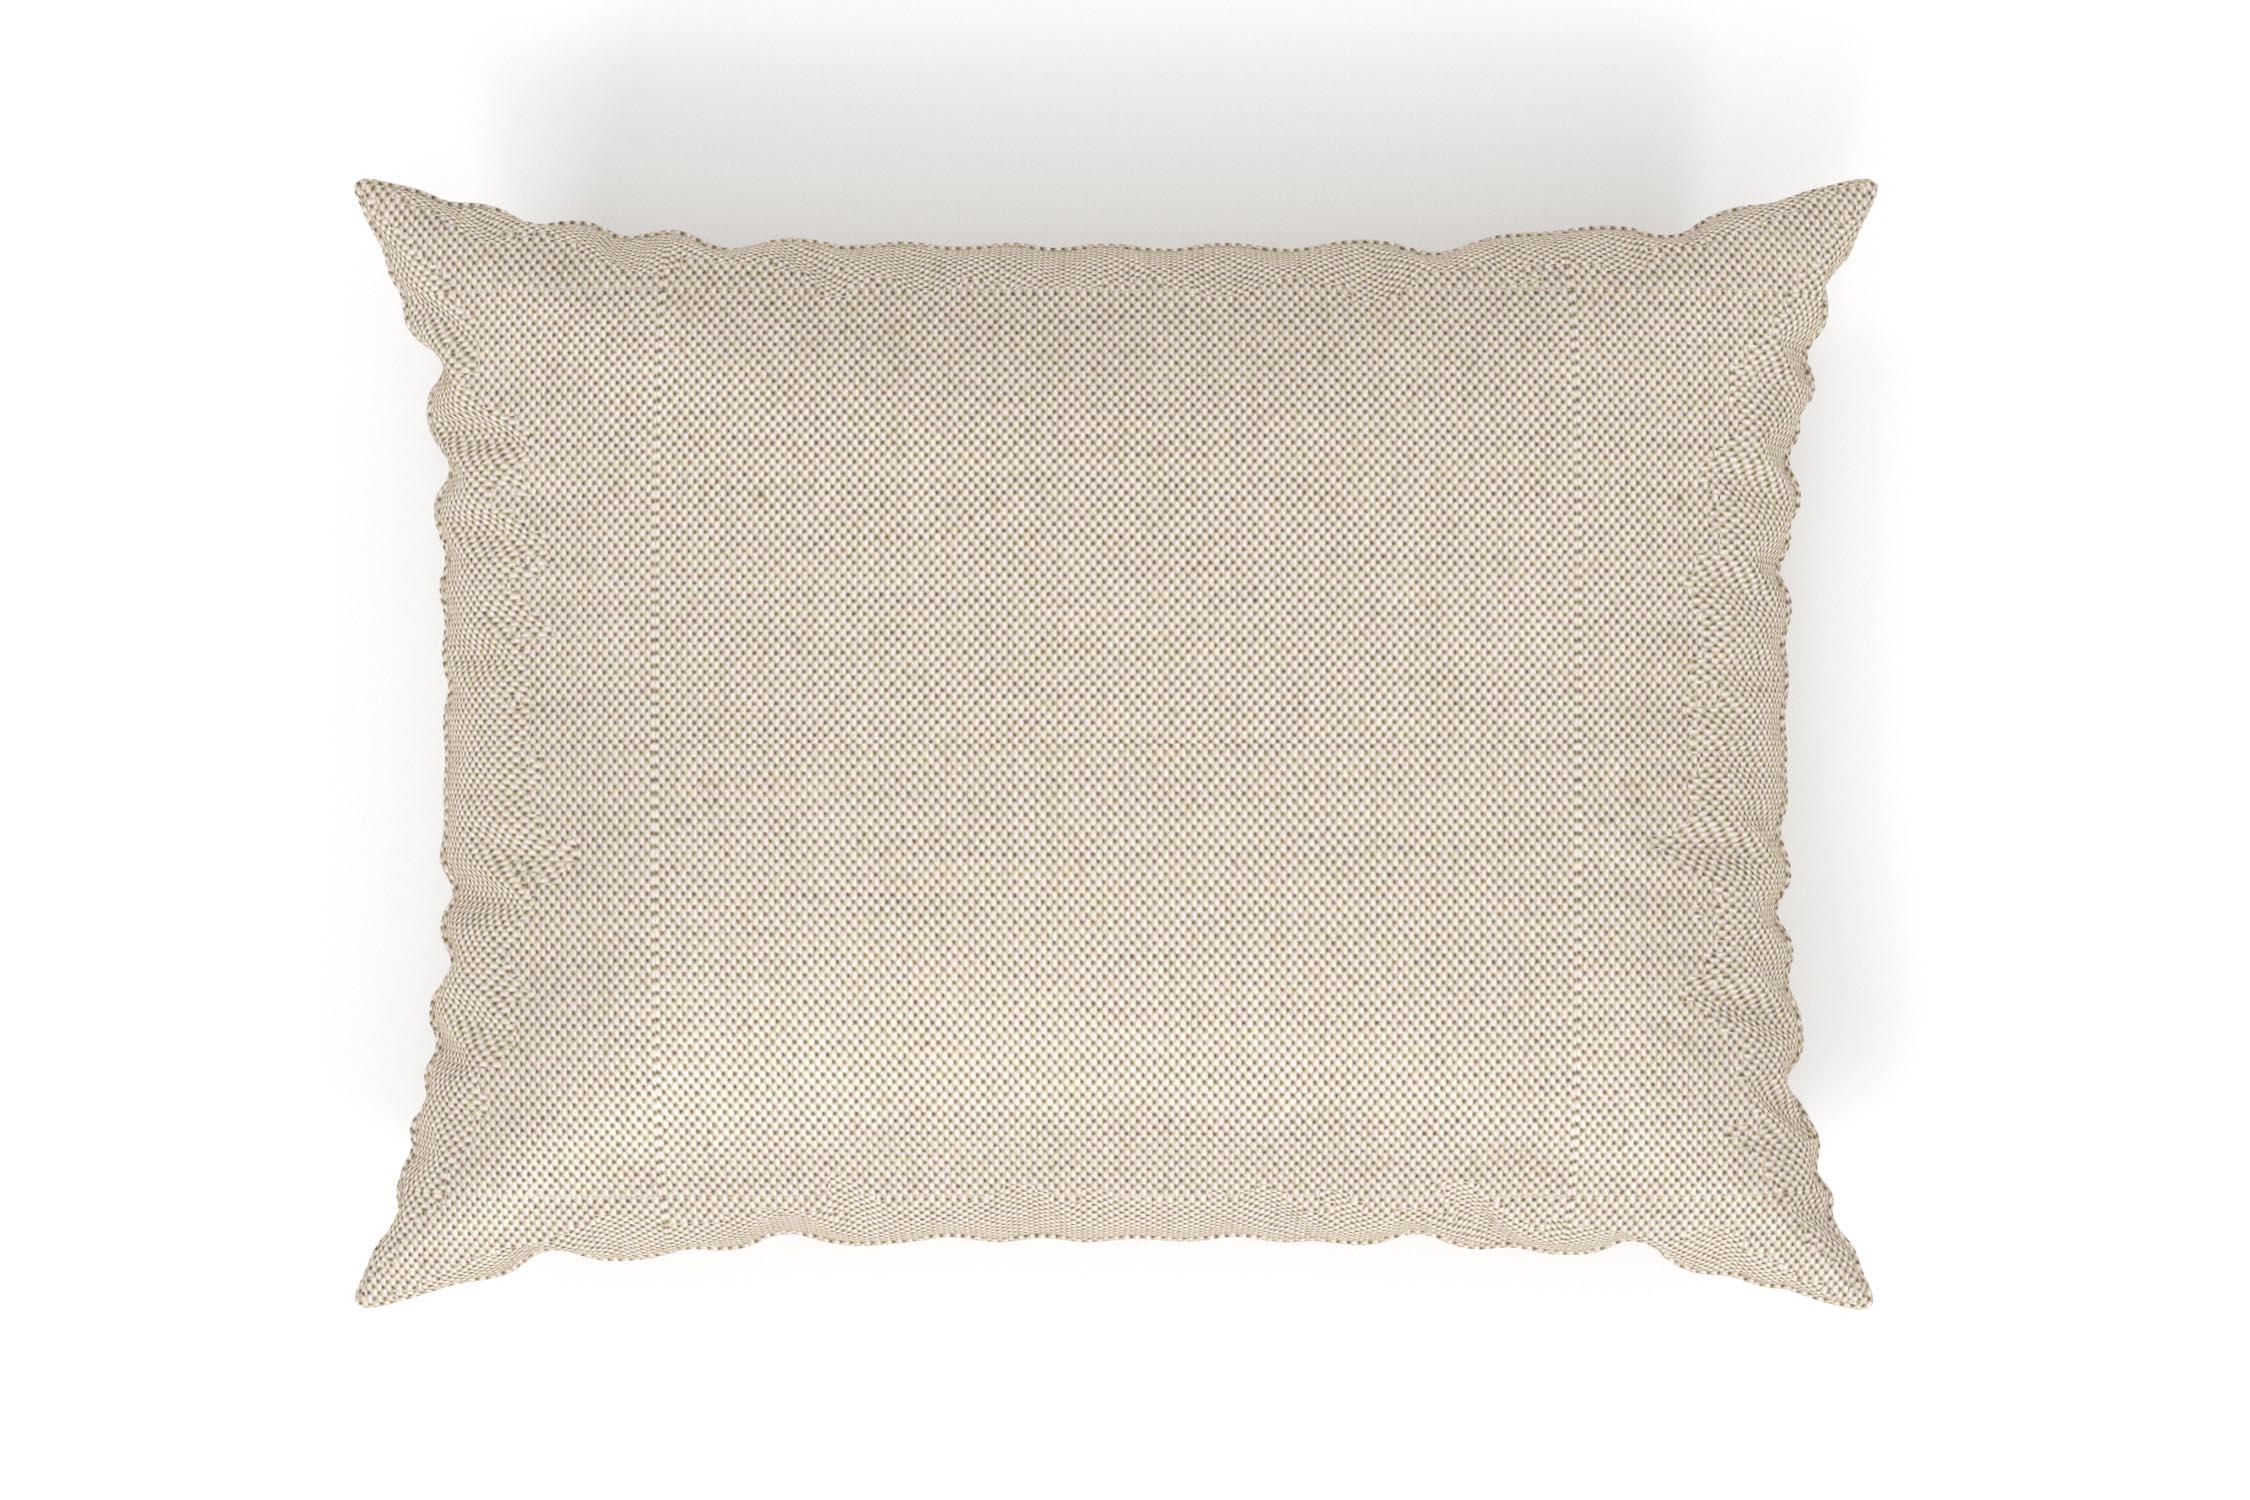 Подушка декоративнаяПрямоугольные подушки и наволочки<br><br><br>Material: Текстиль<br>Ширина см: 40.0<br>Глубина см: 60.0